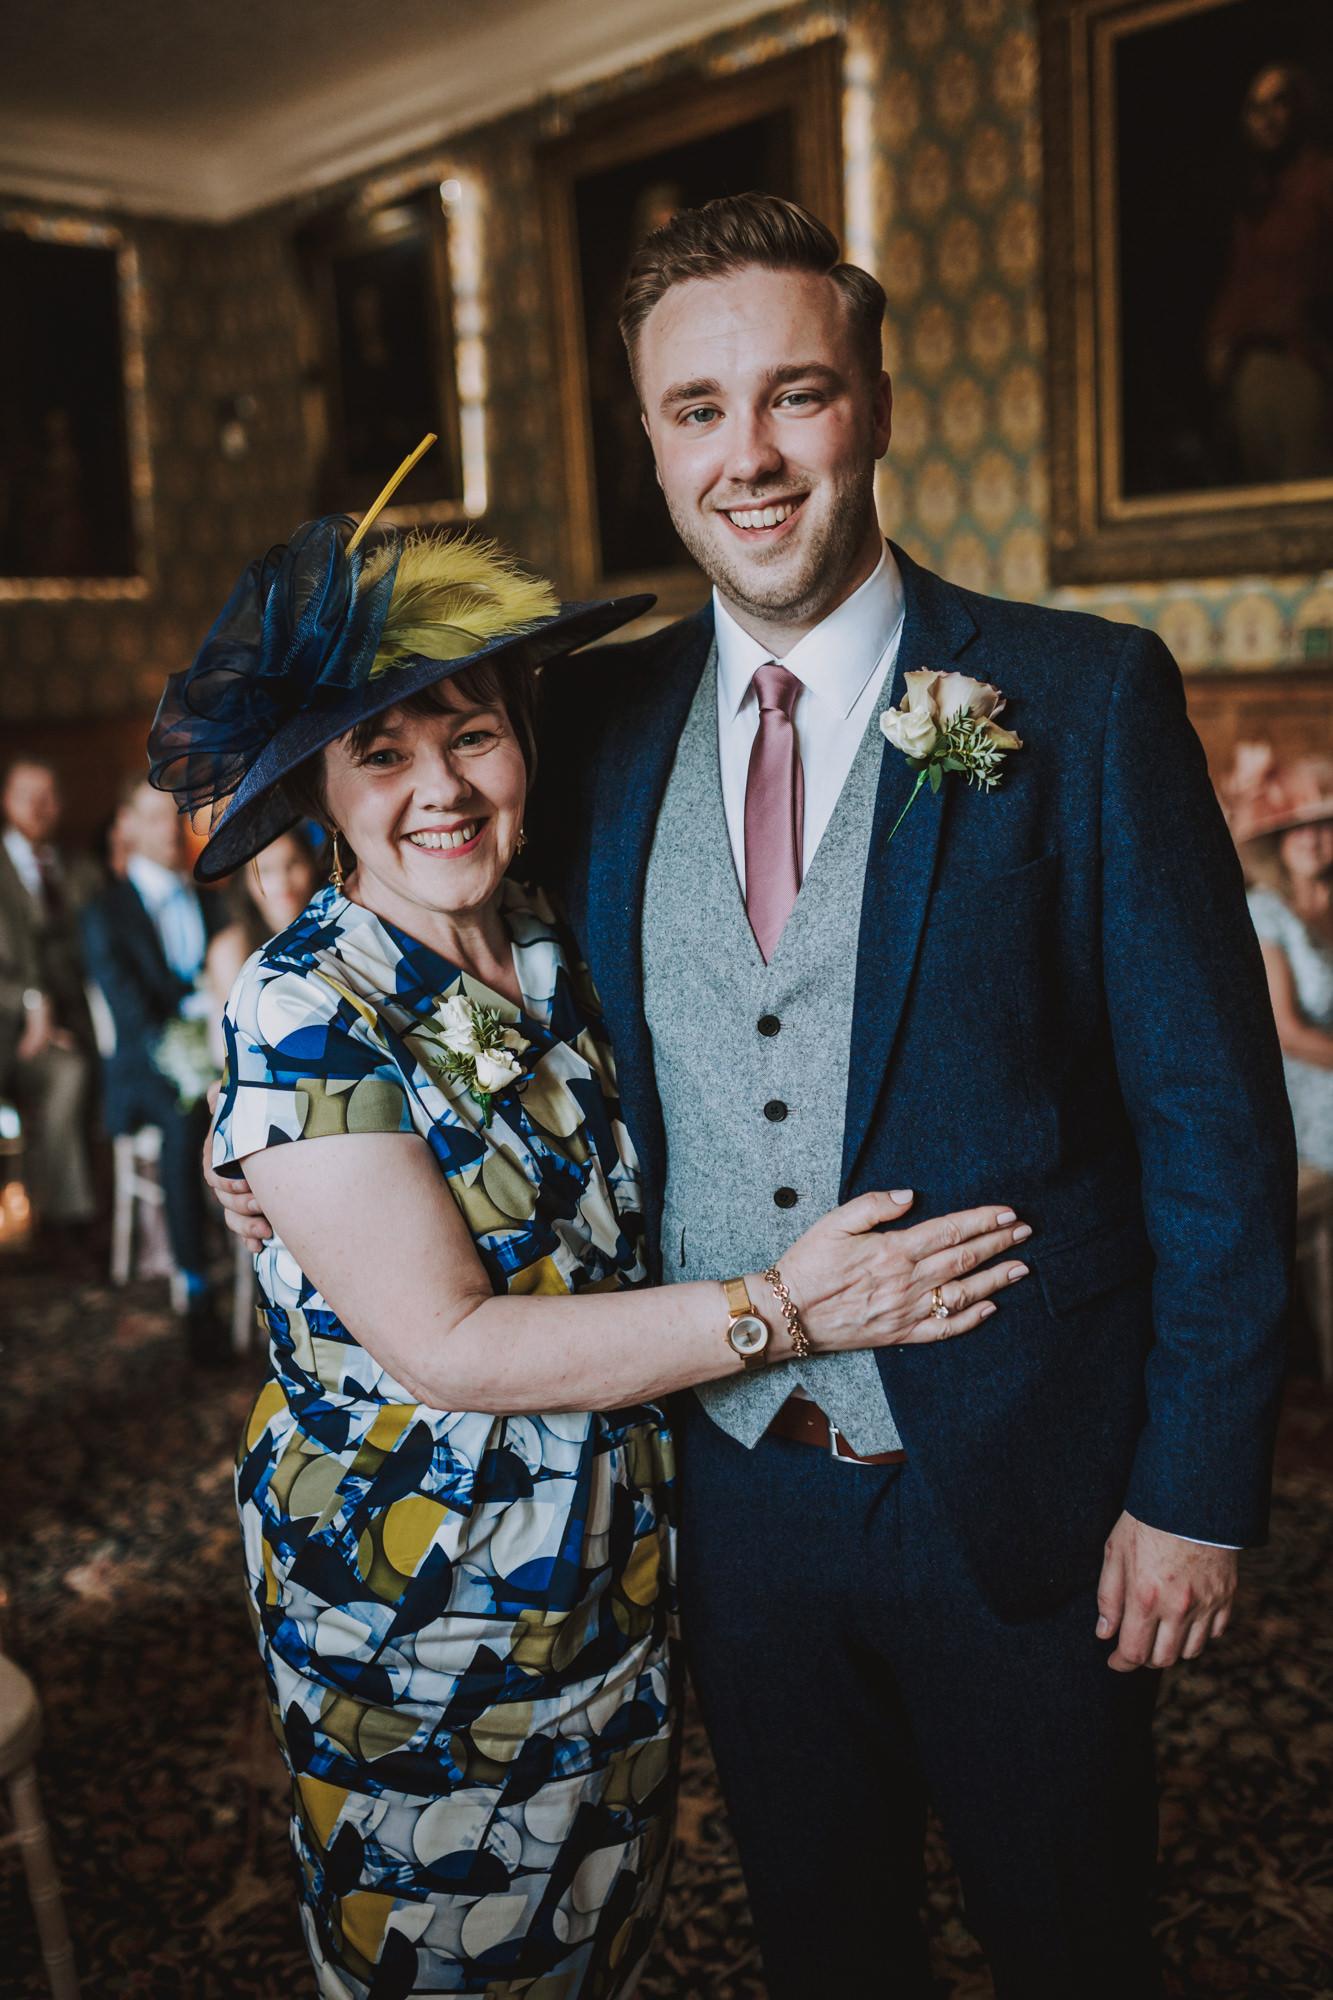 hodsock priory wedding photographers blog39.jpg